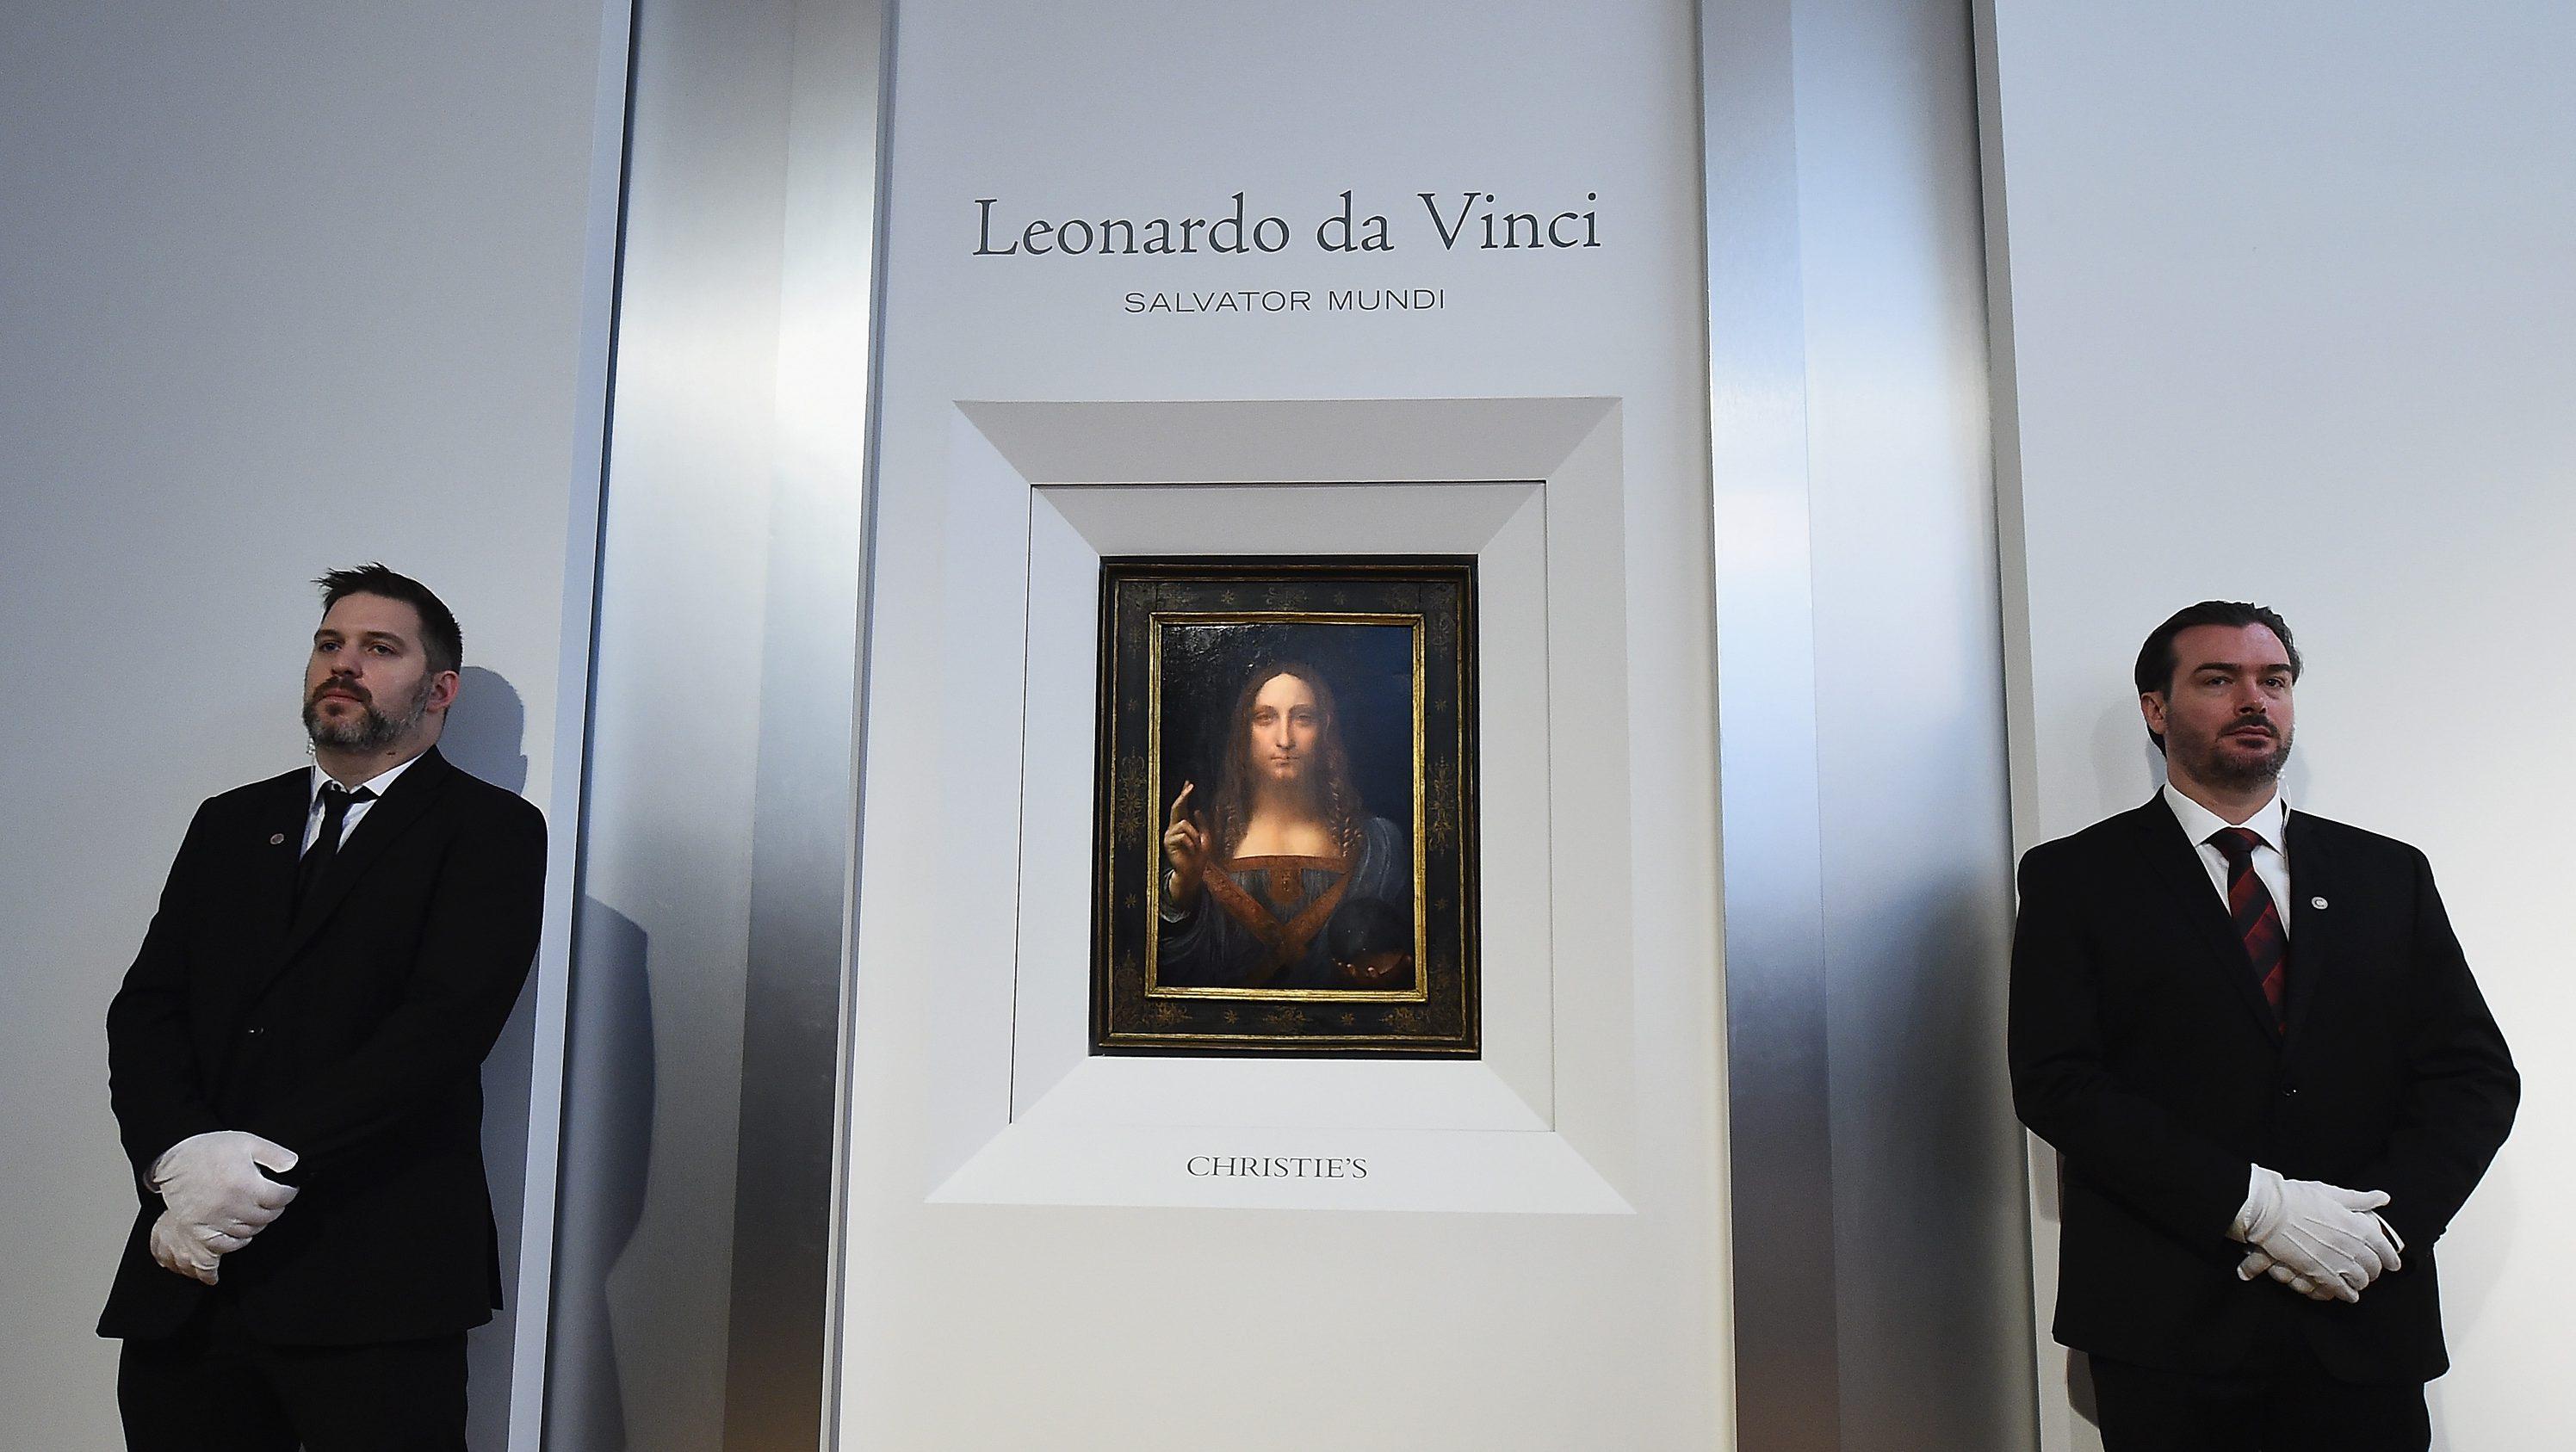 Leonardo da Vanci's last known painting, Salvator Mundi, was